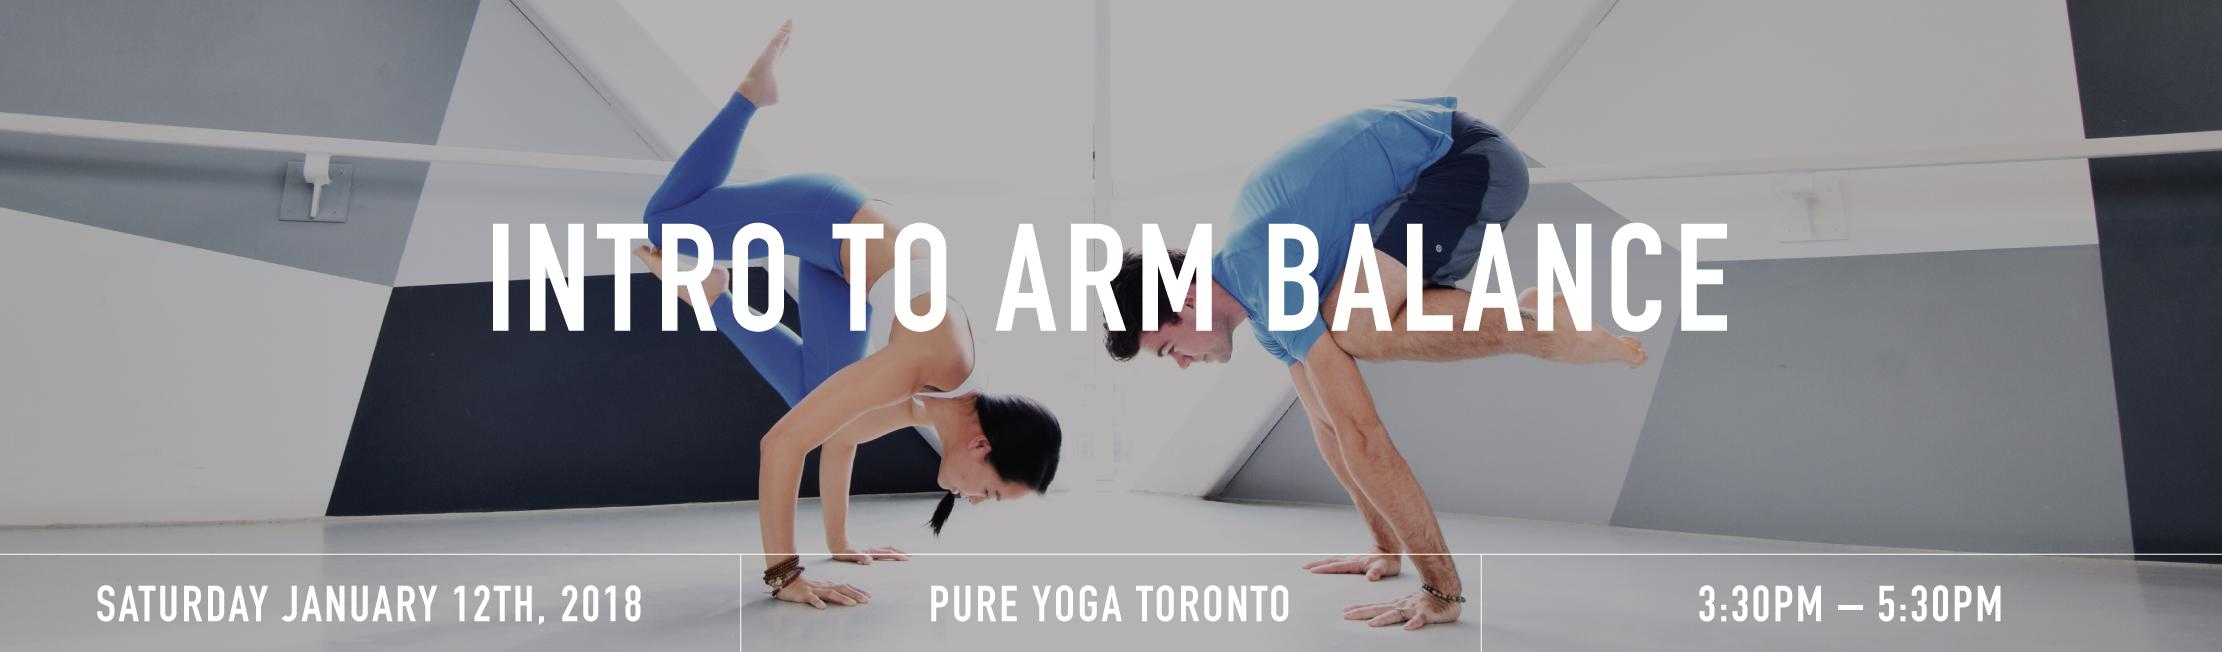 Intro to arm balances banner